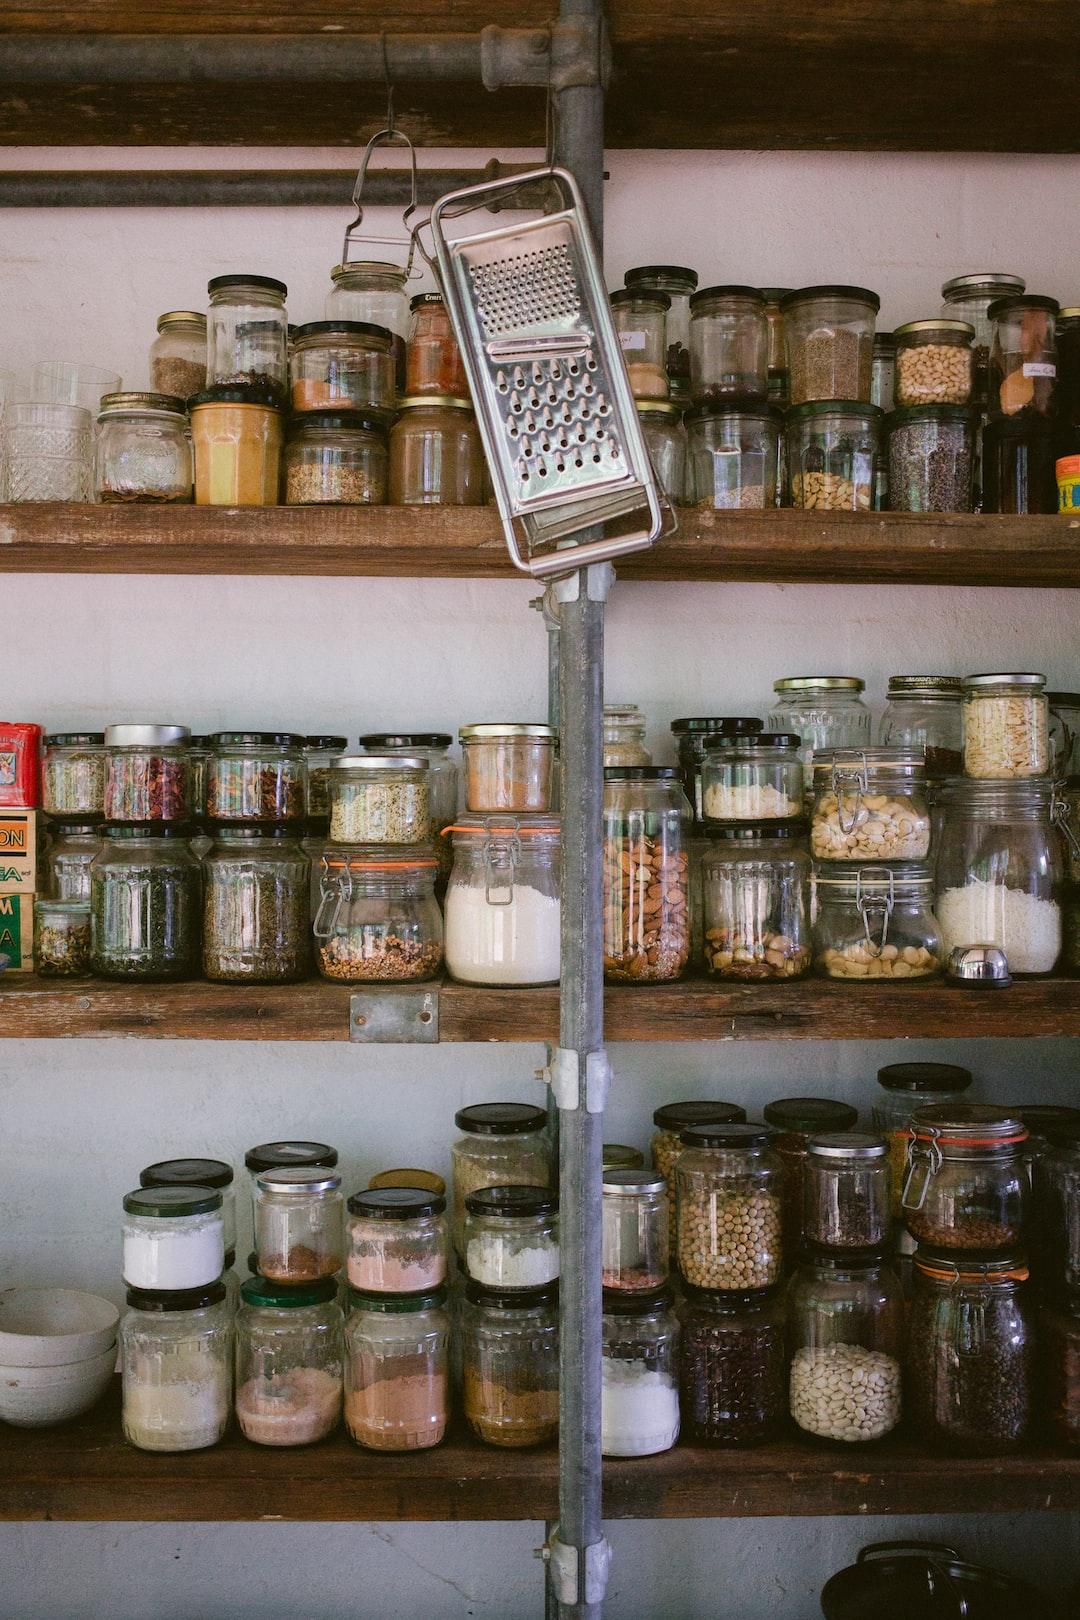 shelf, home, space, interior, kitchen shelf, pantry, kitchen pantry, this is Sabine Bannard's house - https://www.instagram.com/_housefrau/